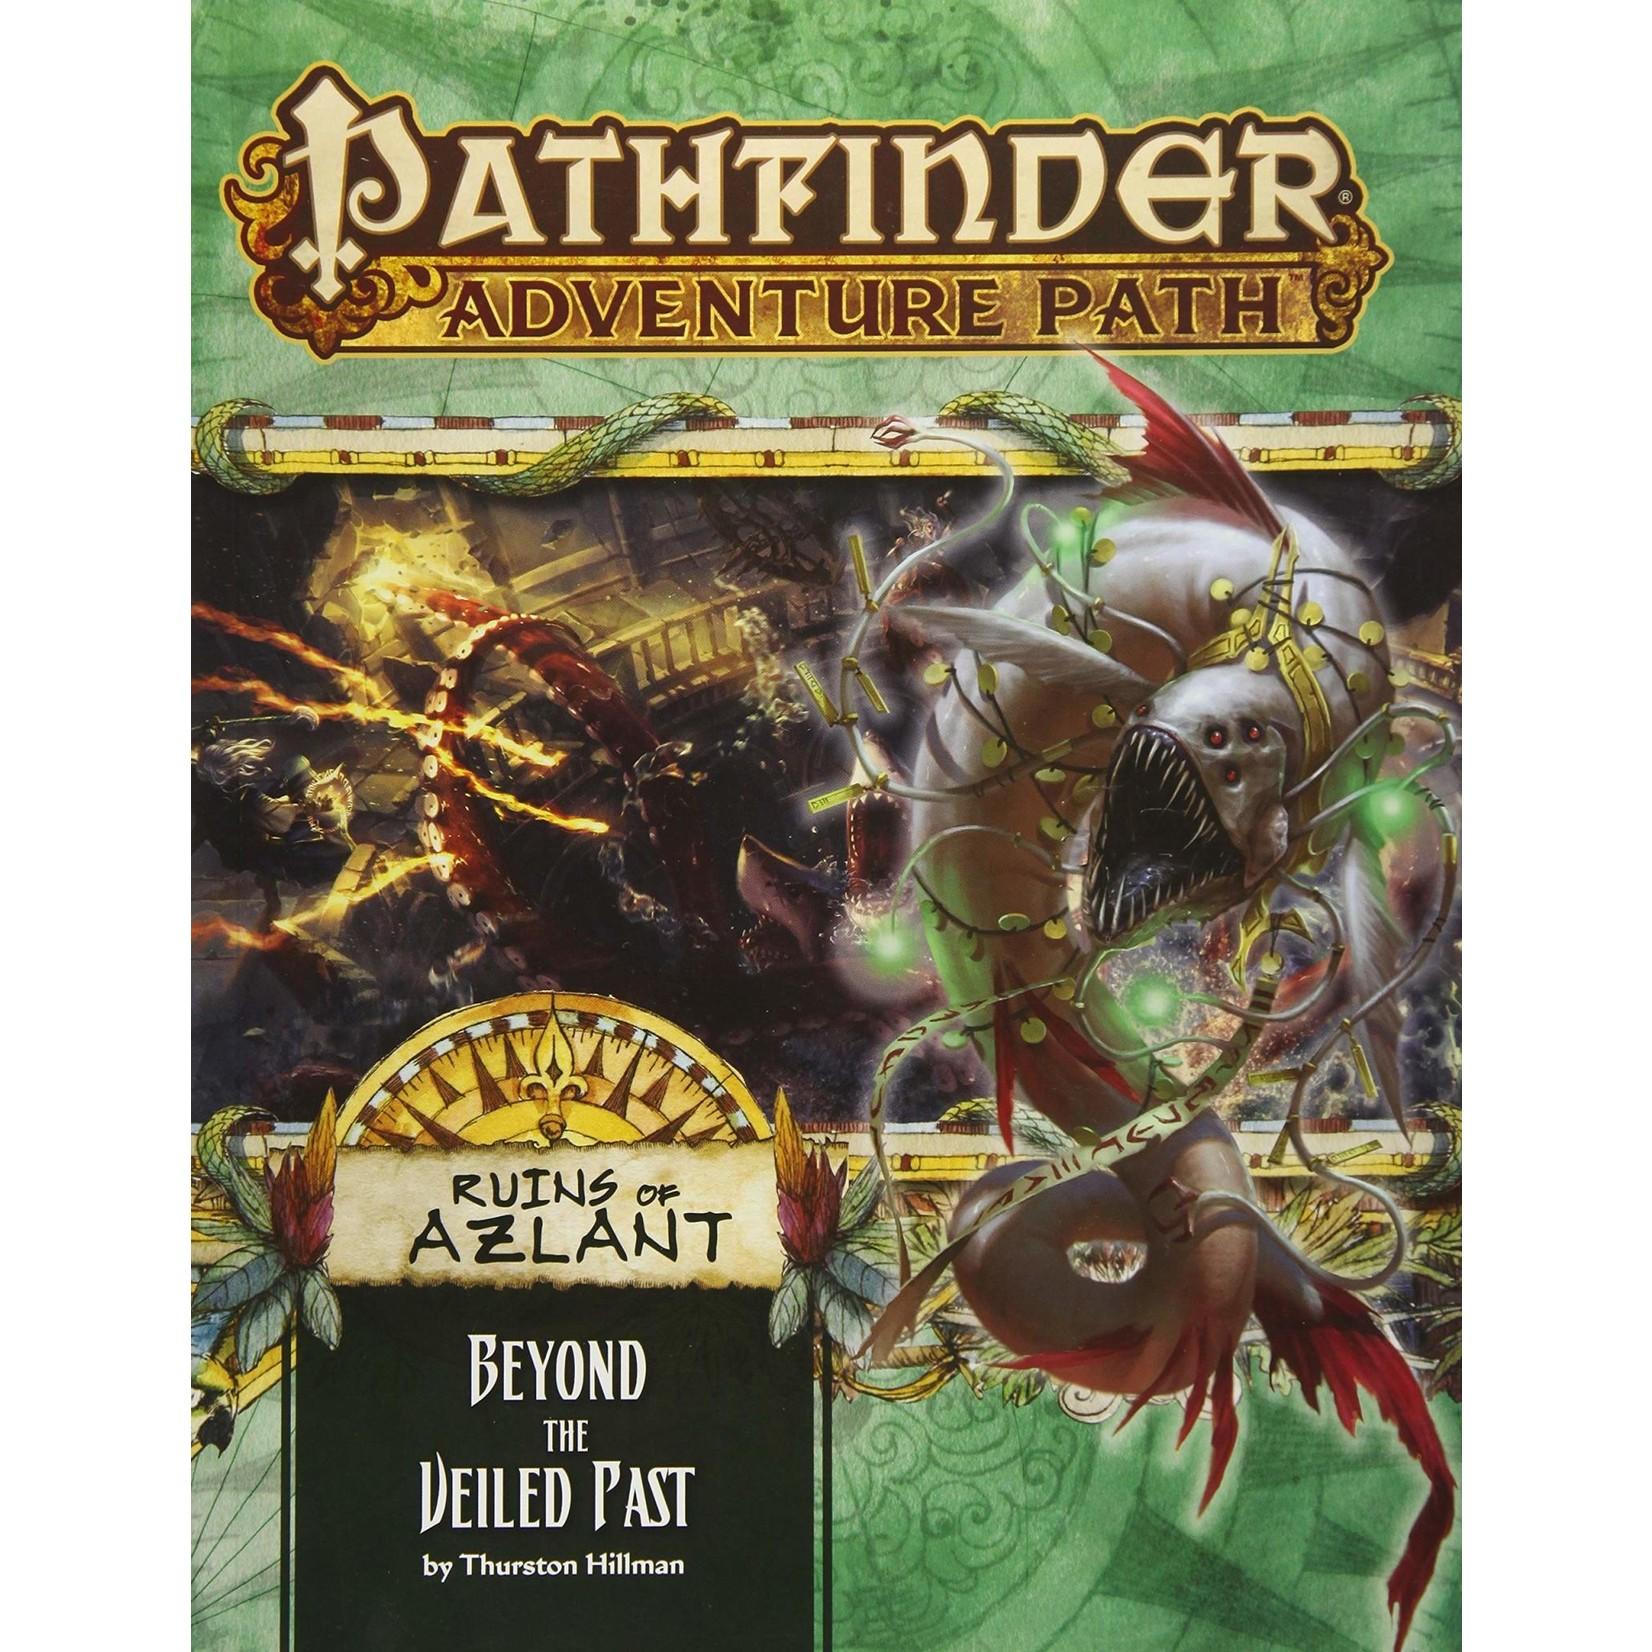 Pathfinder Adventure Path: Ruins of Azlant 5 Beyond the Veiled Past